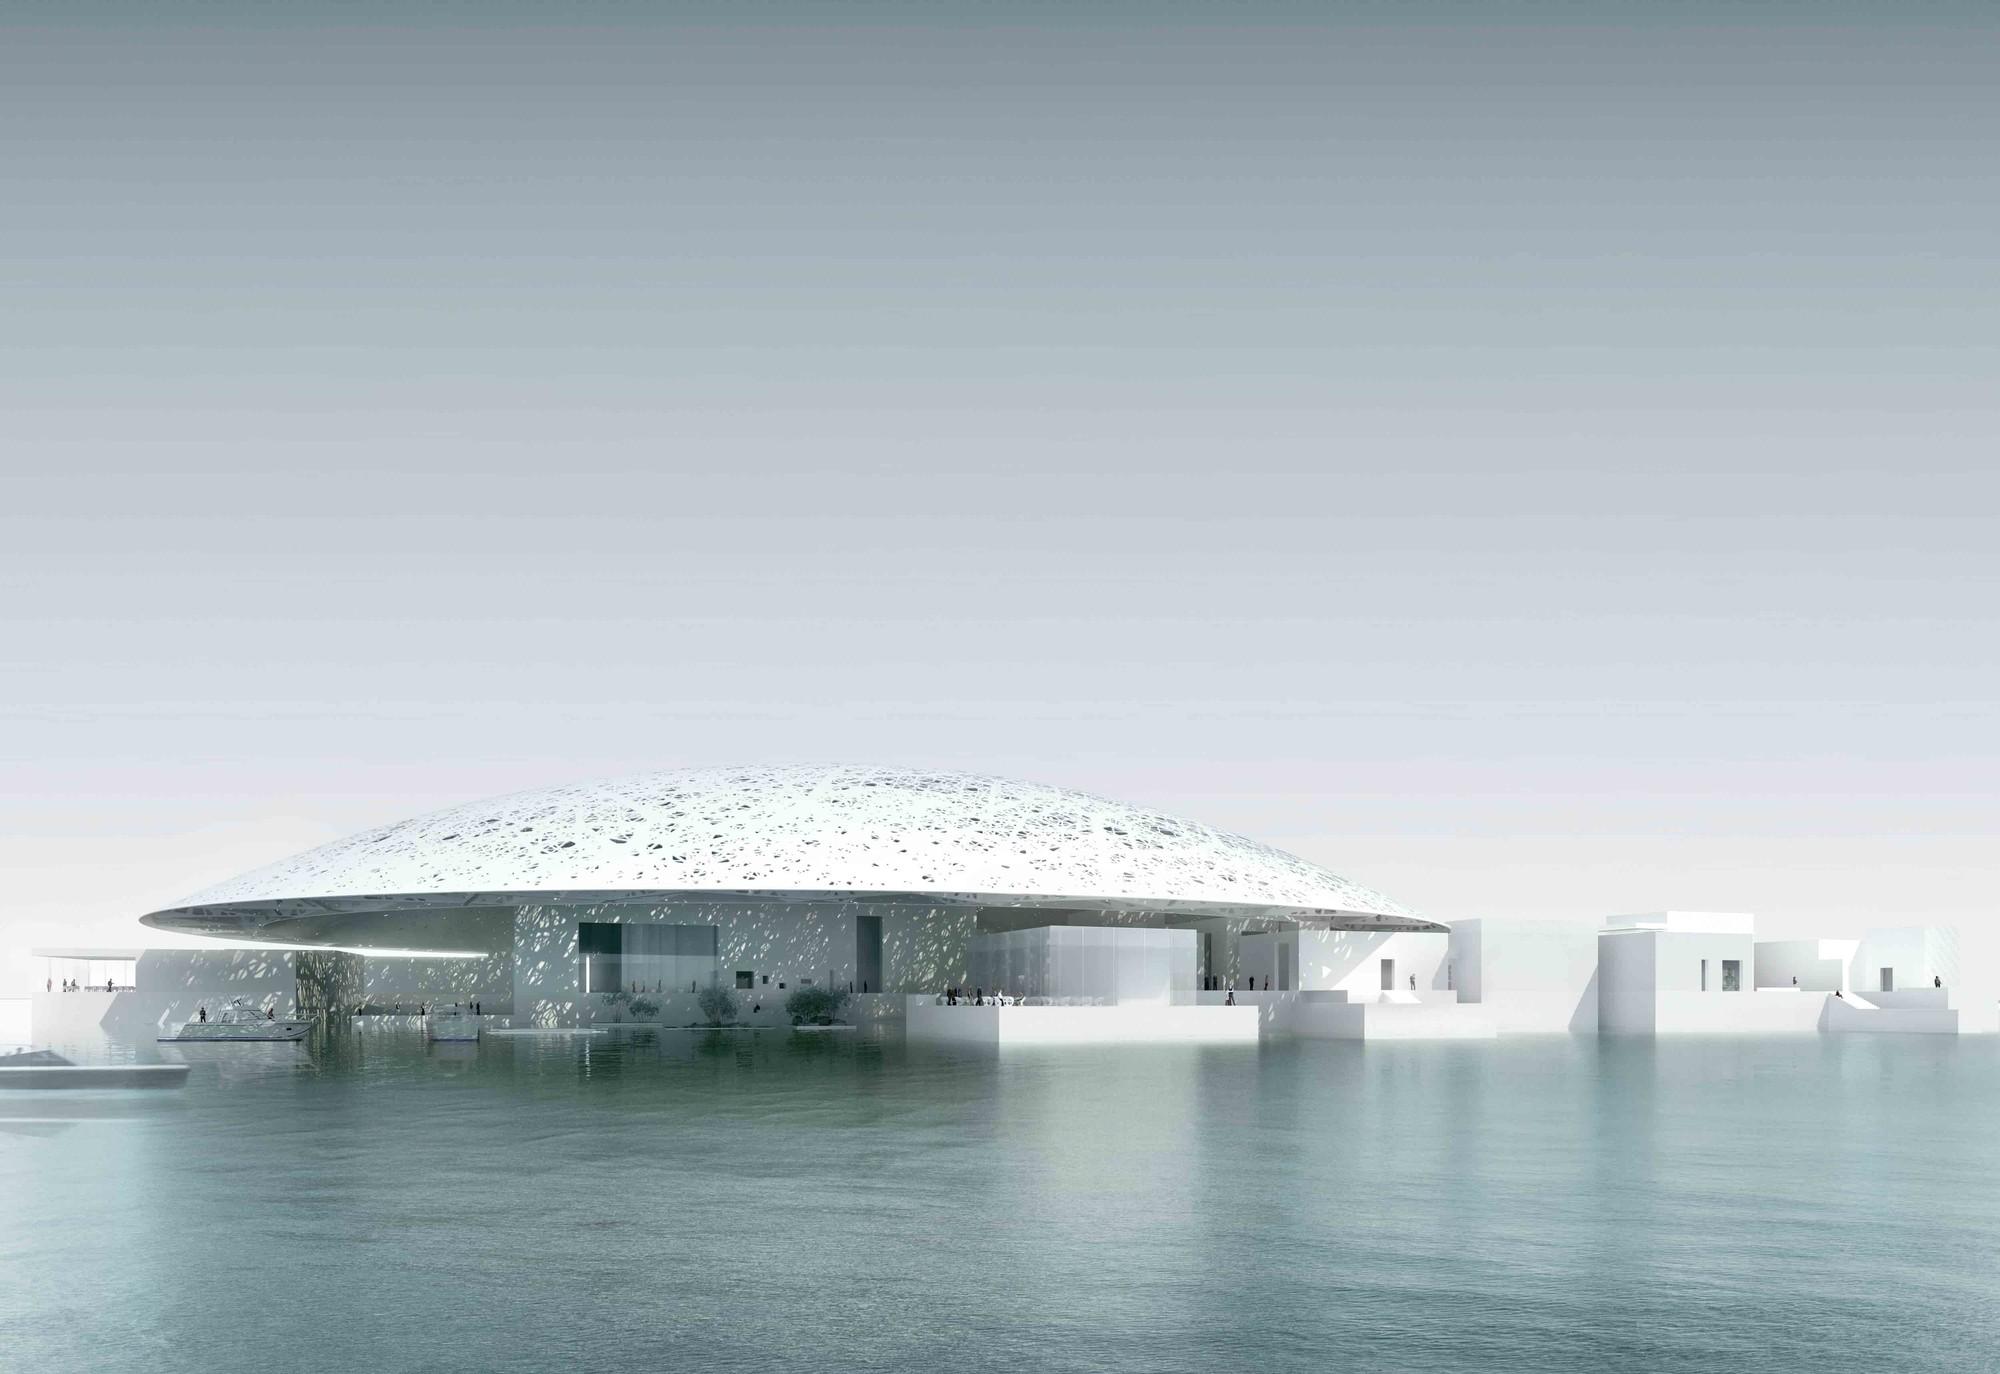 El Museo de Louvre de Abu Dhabi / Ateliers Jean Nouvel, Cortesía de Ateliers Jean Nouvel